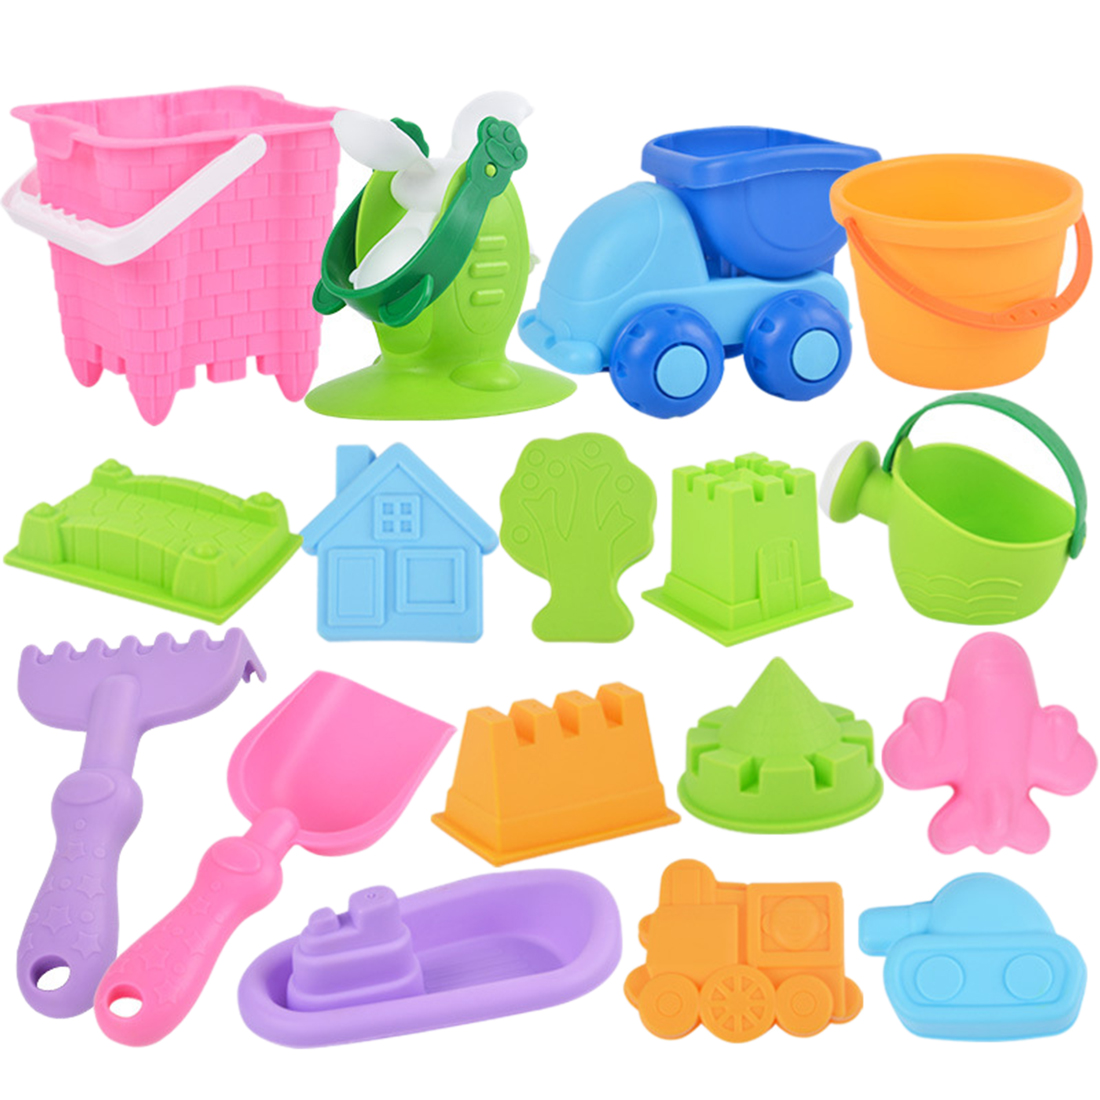 17Pcs Baby Beach Sand Toys Sand Water Playset Seaside Soft Plastic Bucket Shovel Sand Set For Children Kids - Color Random